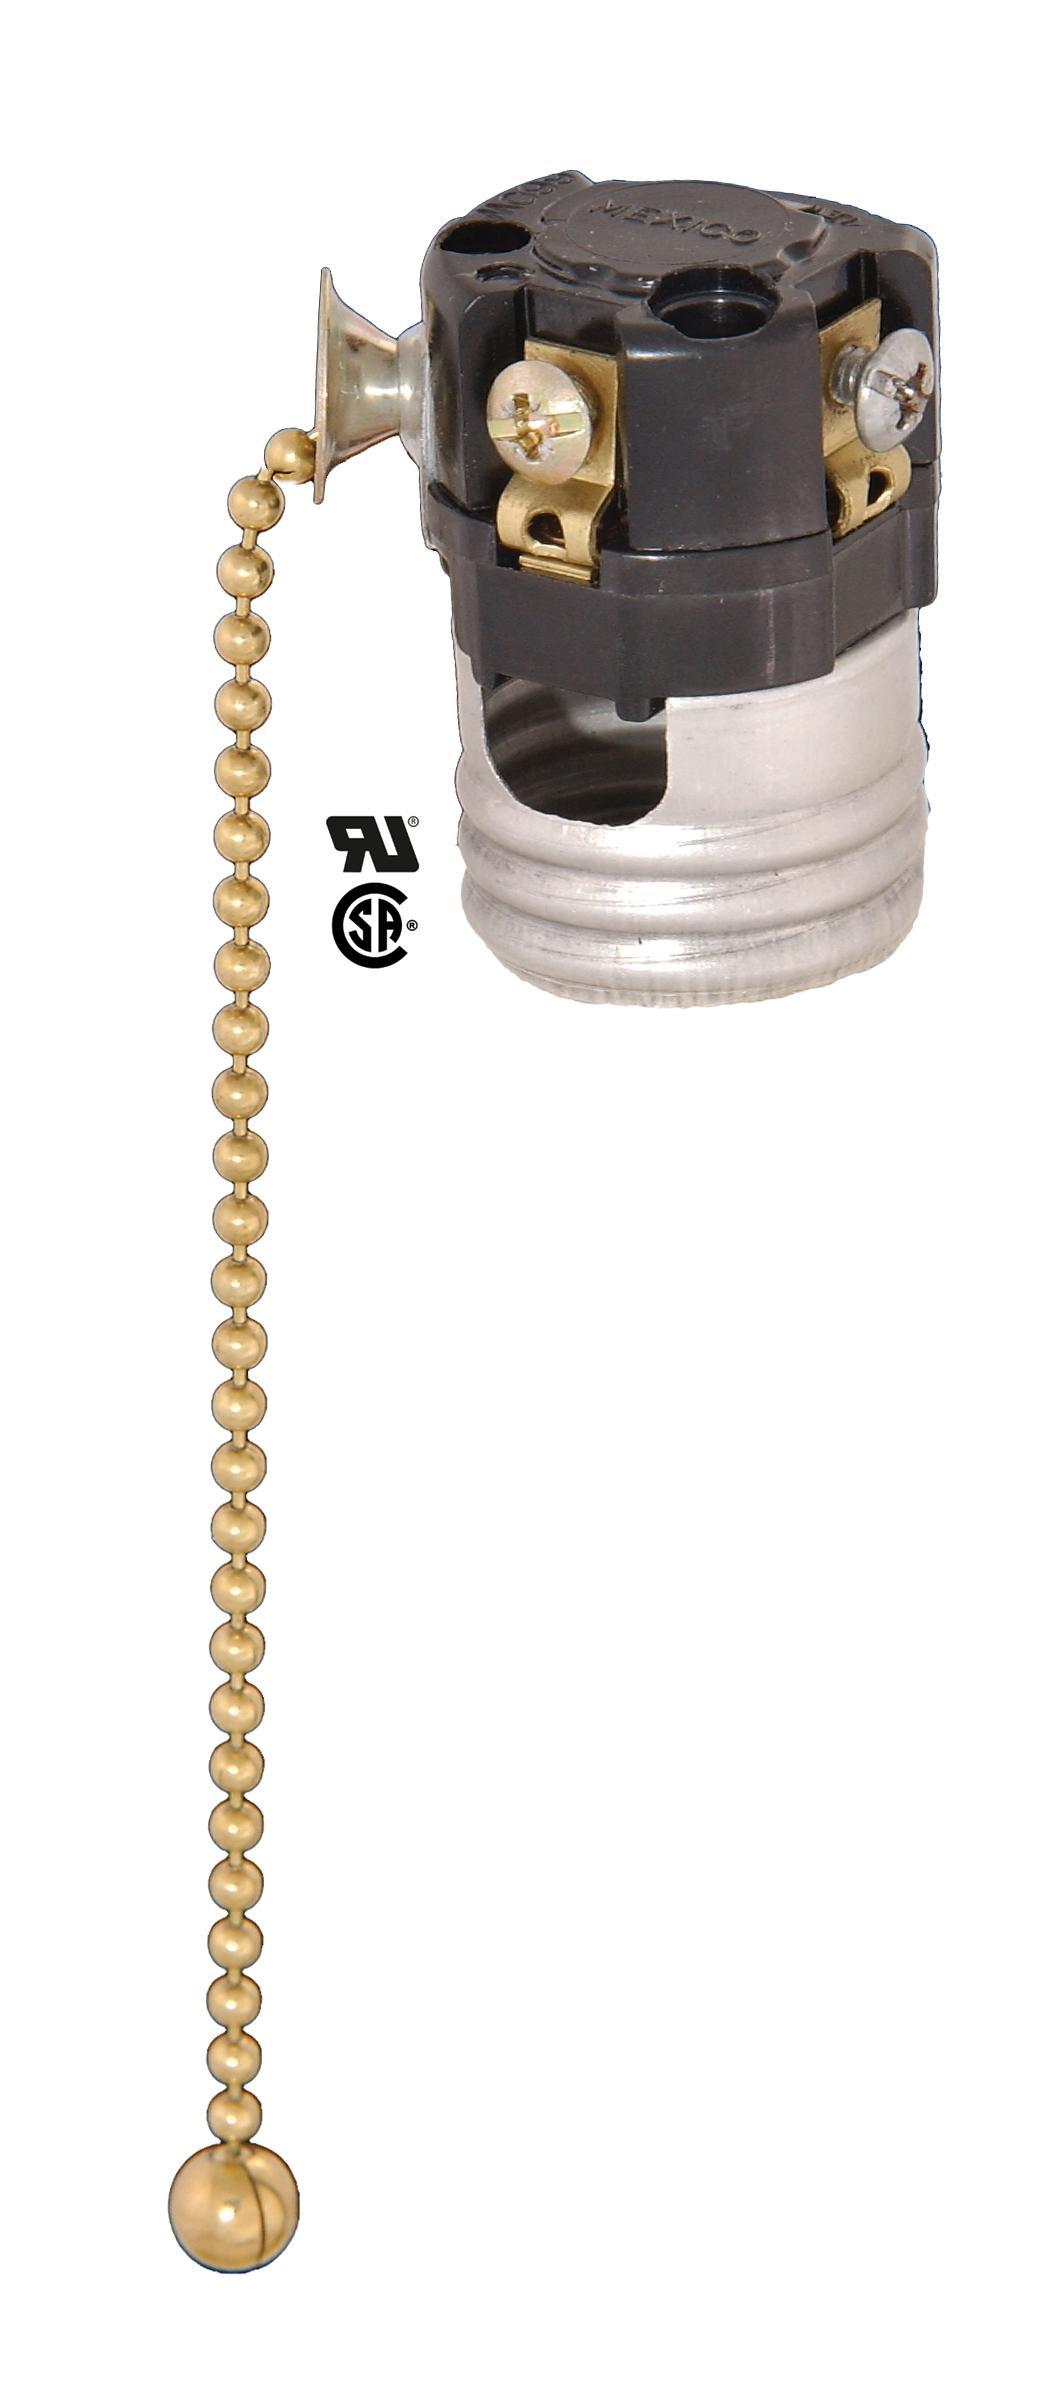 B P Lamp Pull Chain Socket Interior No Paper Insulator